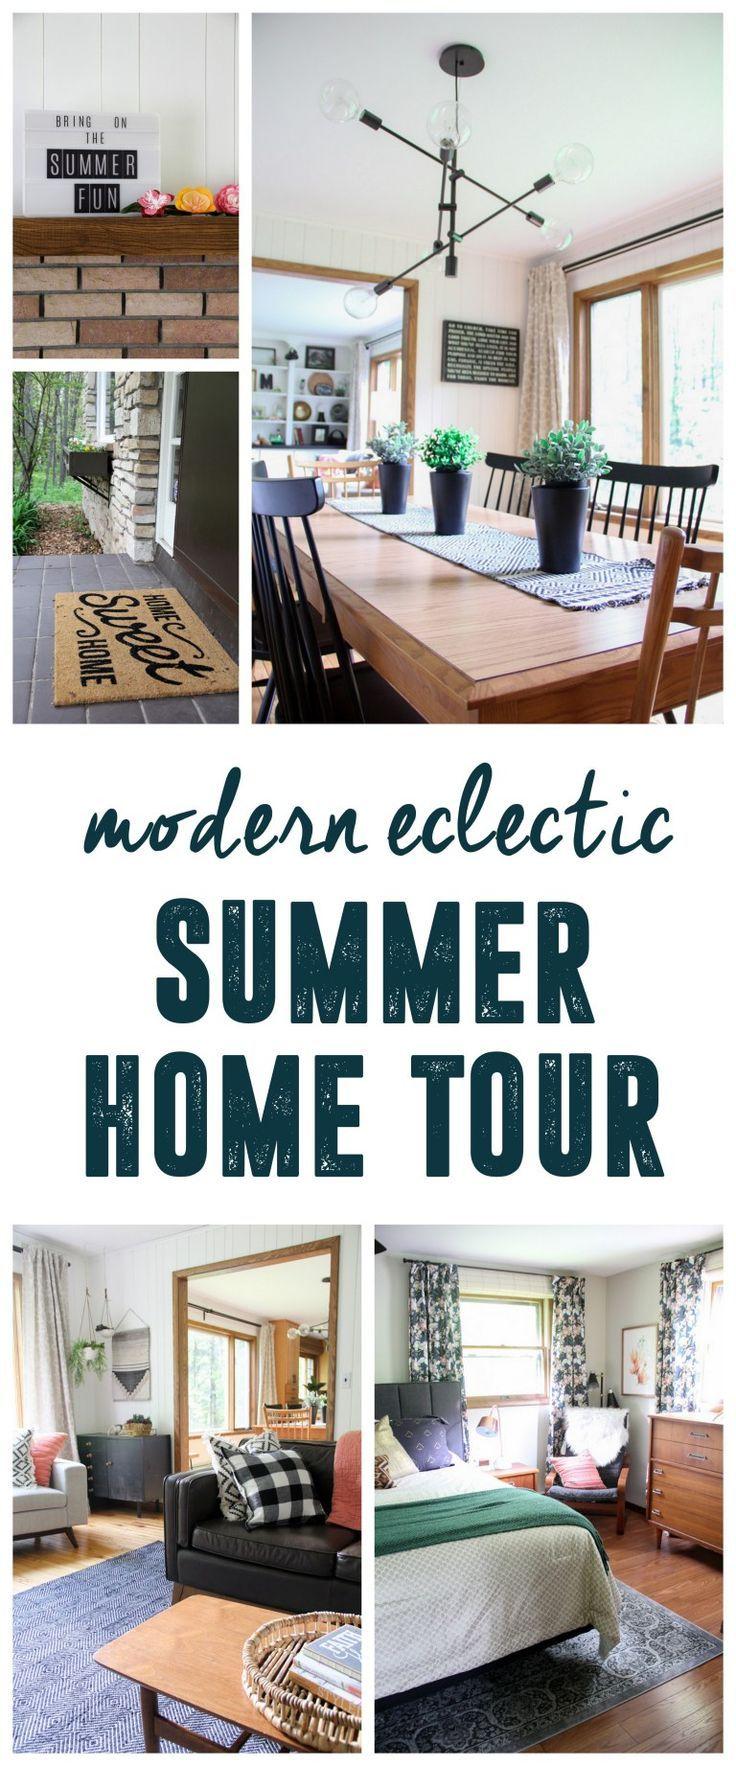 Modern Eclectic Summer Home Tour www.BrightGreenDo...